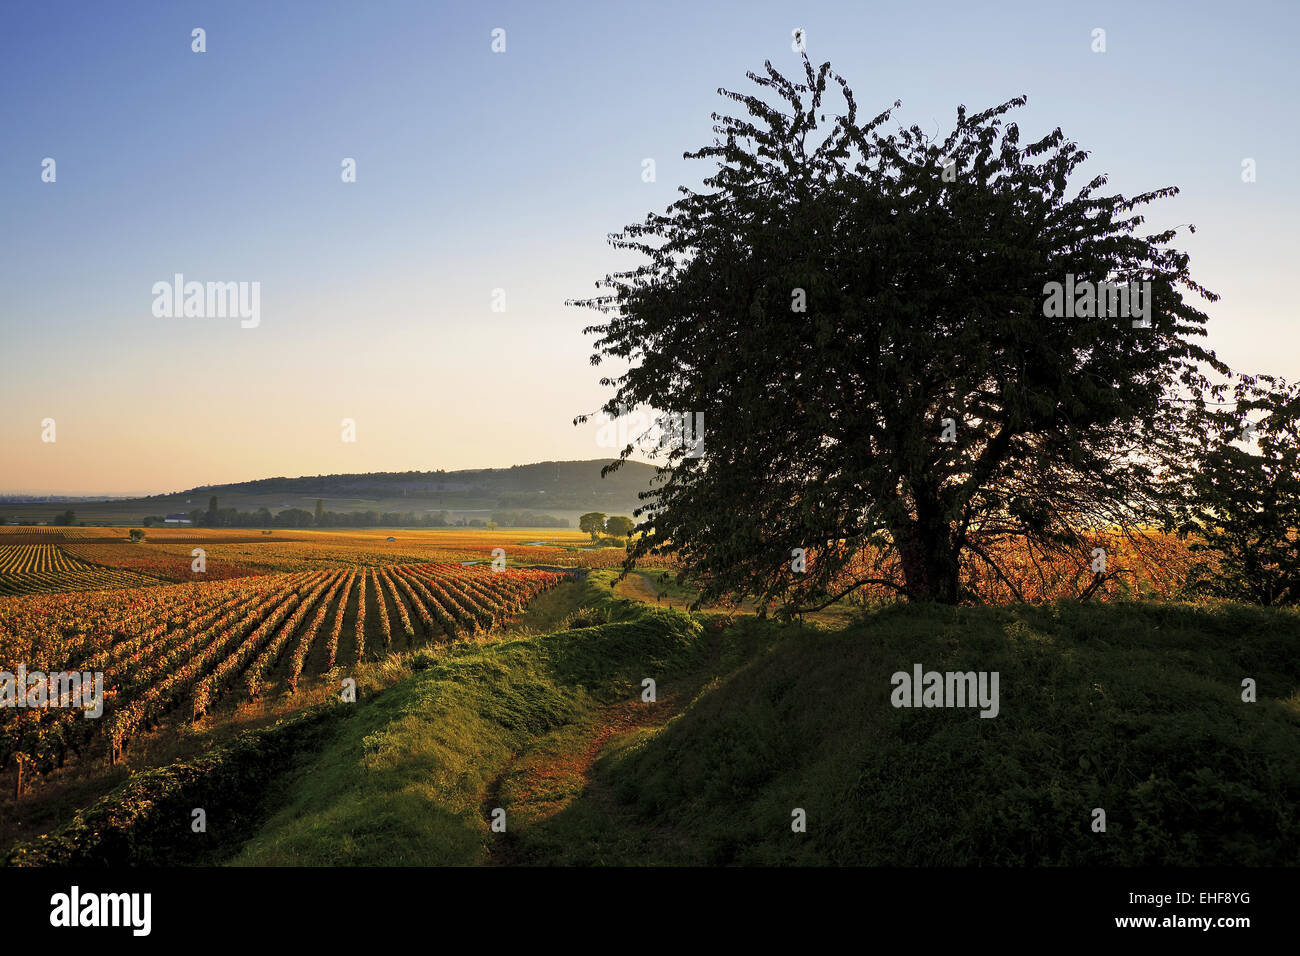 vineyards near Savigny-les-Beaune, Burgundy - Stock Image